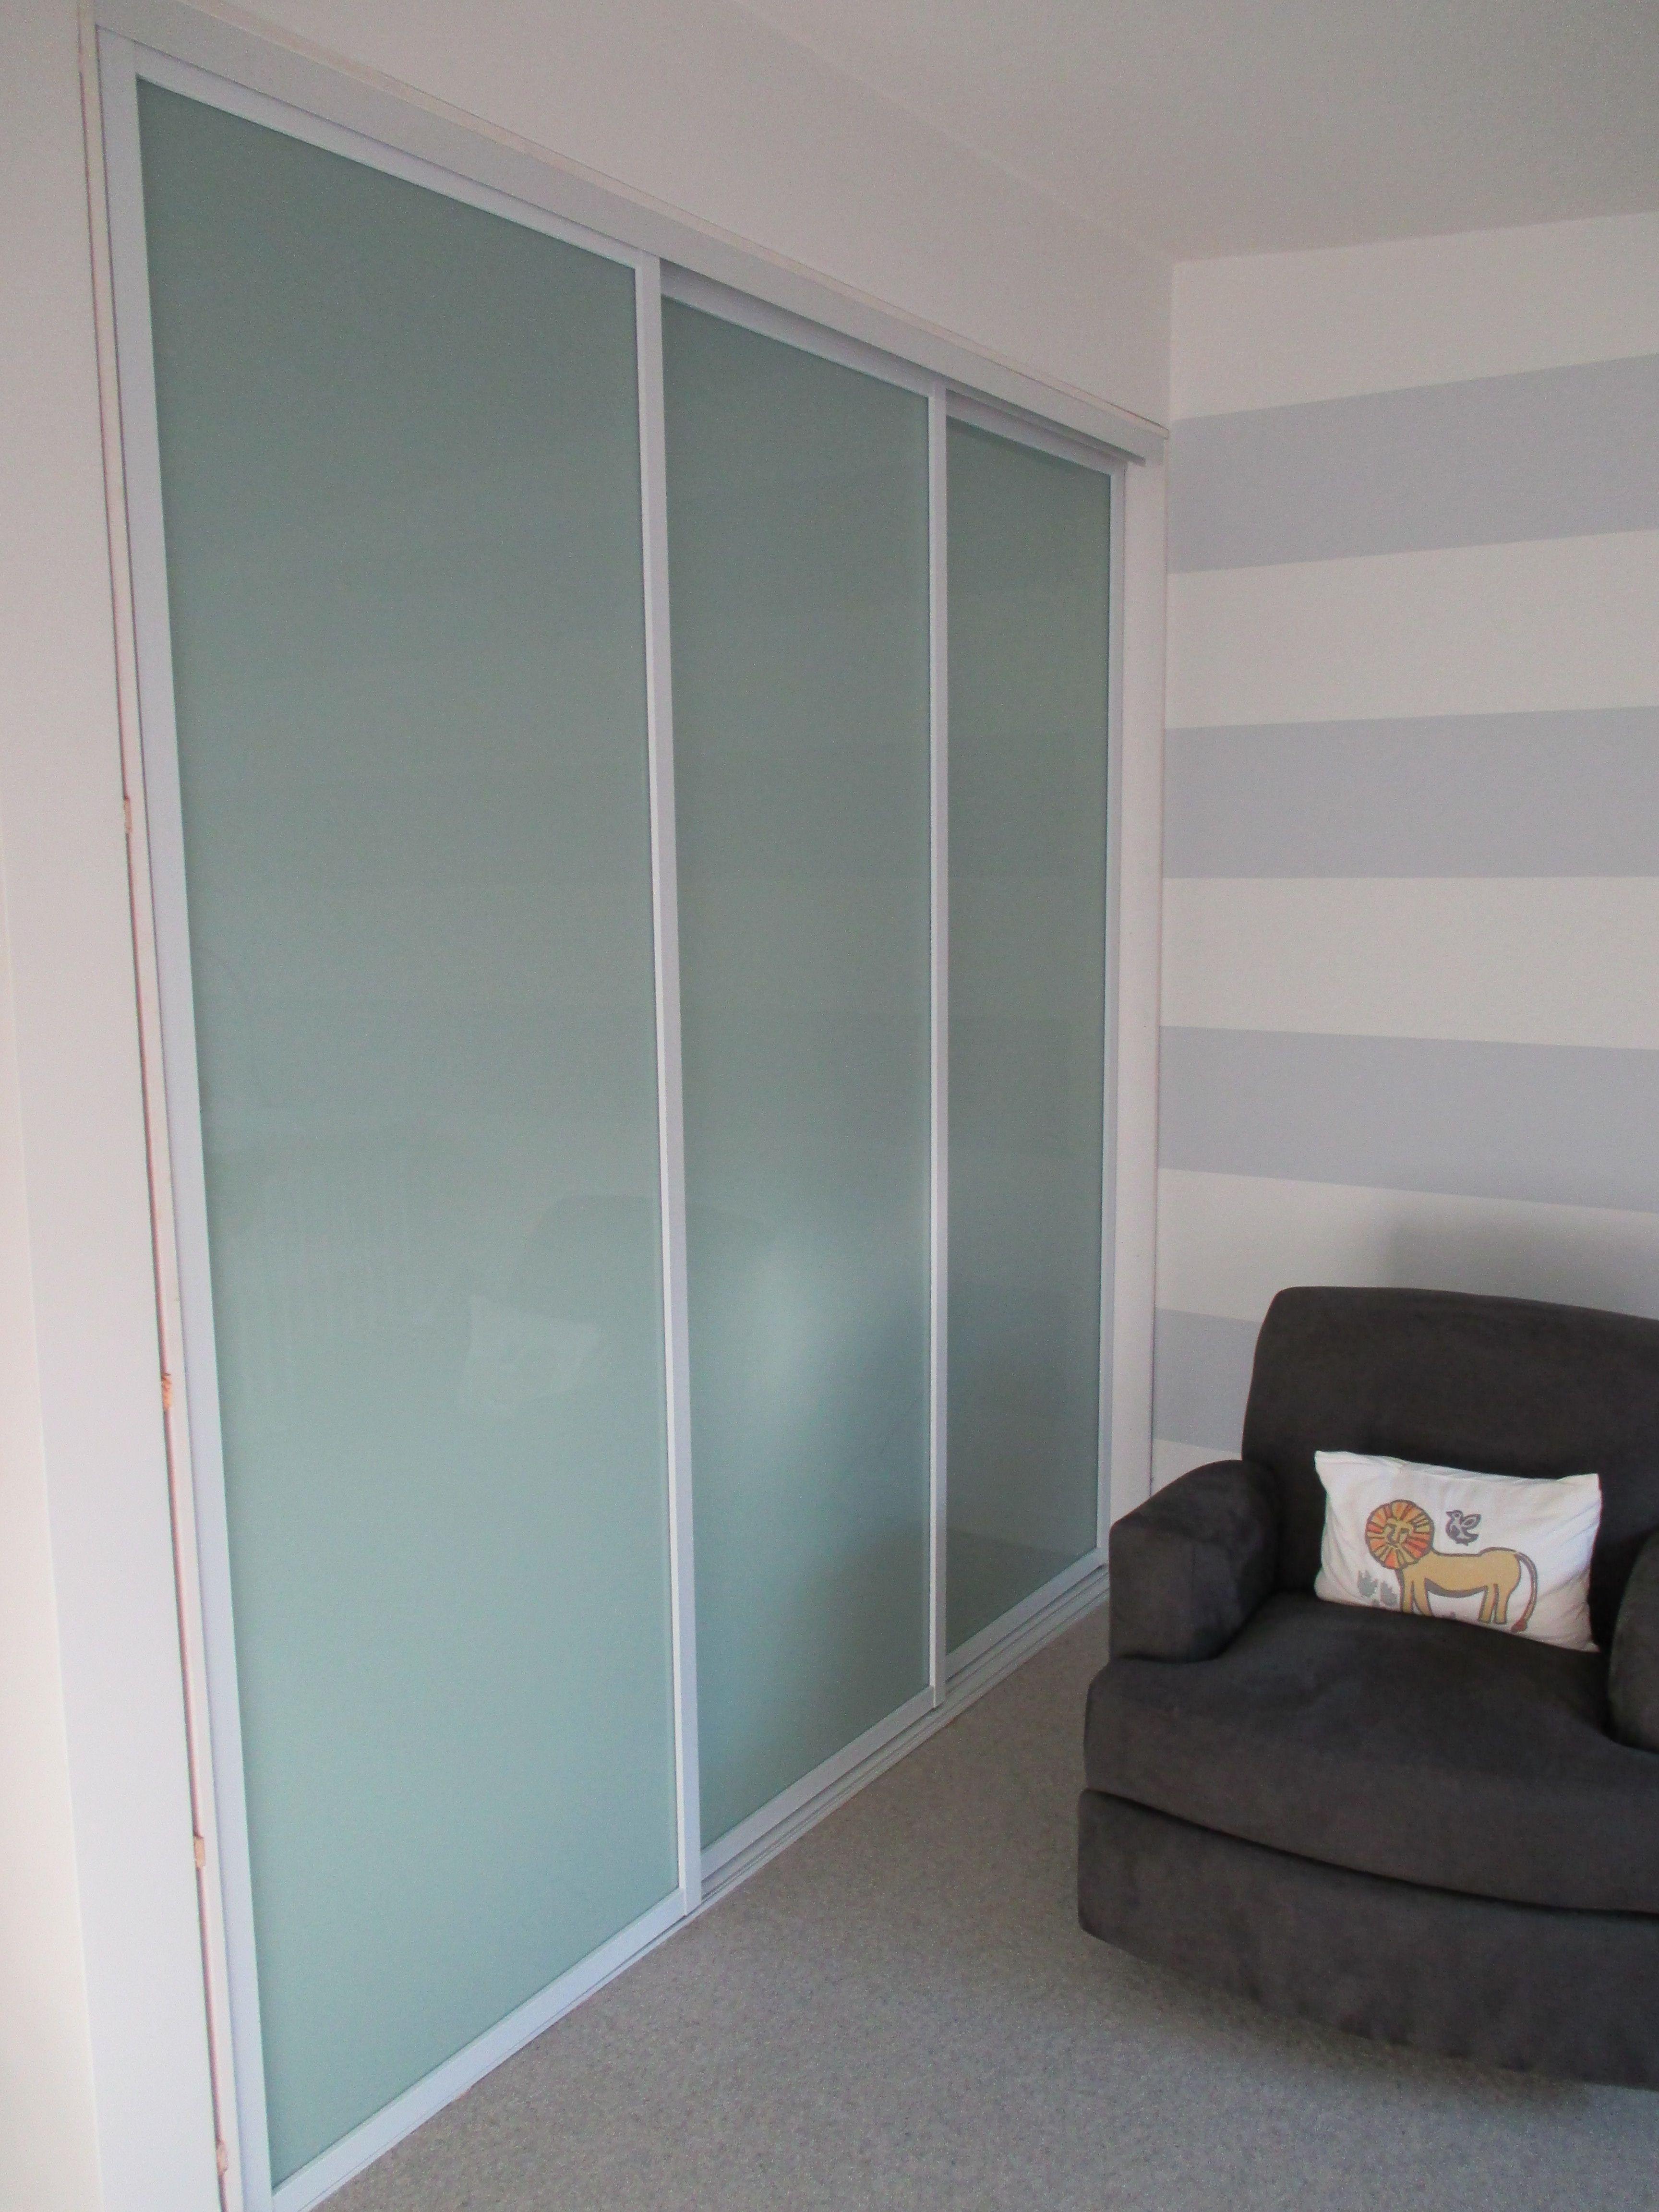 Simple Sliding Closet Doors Three Panel Home Decor